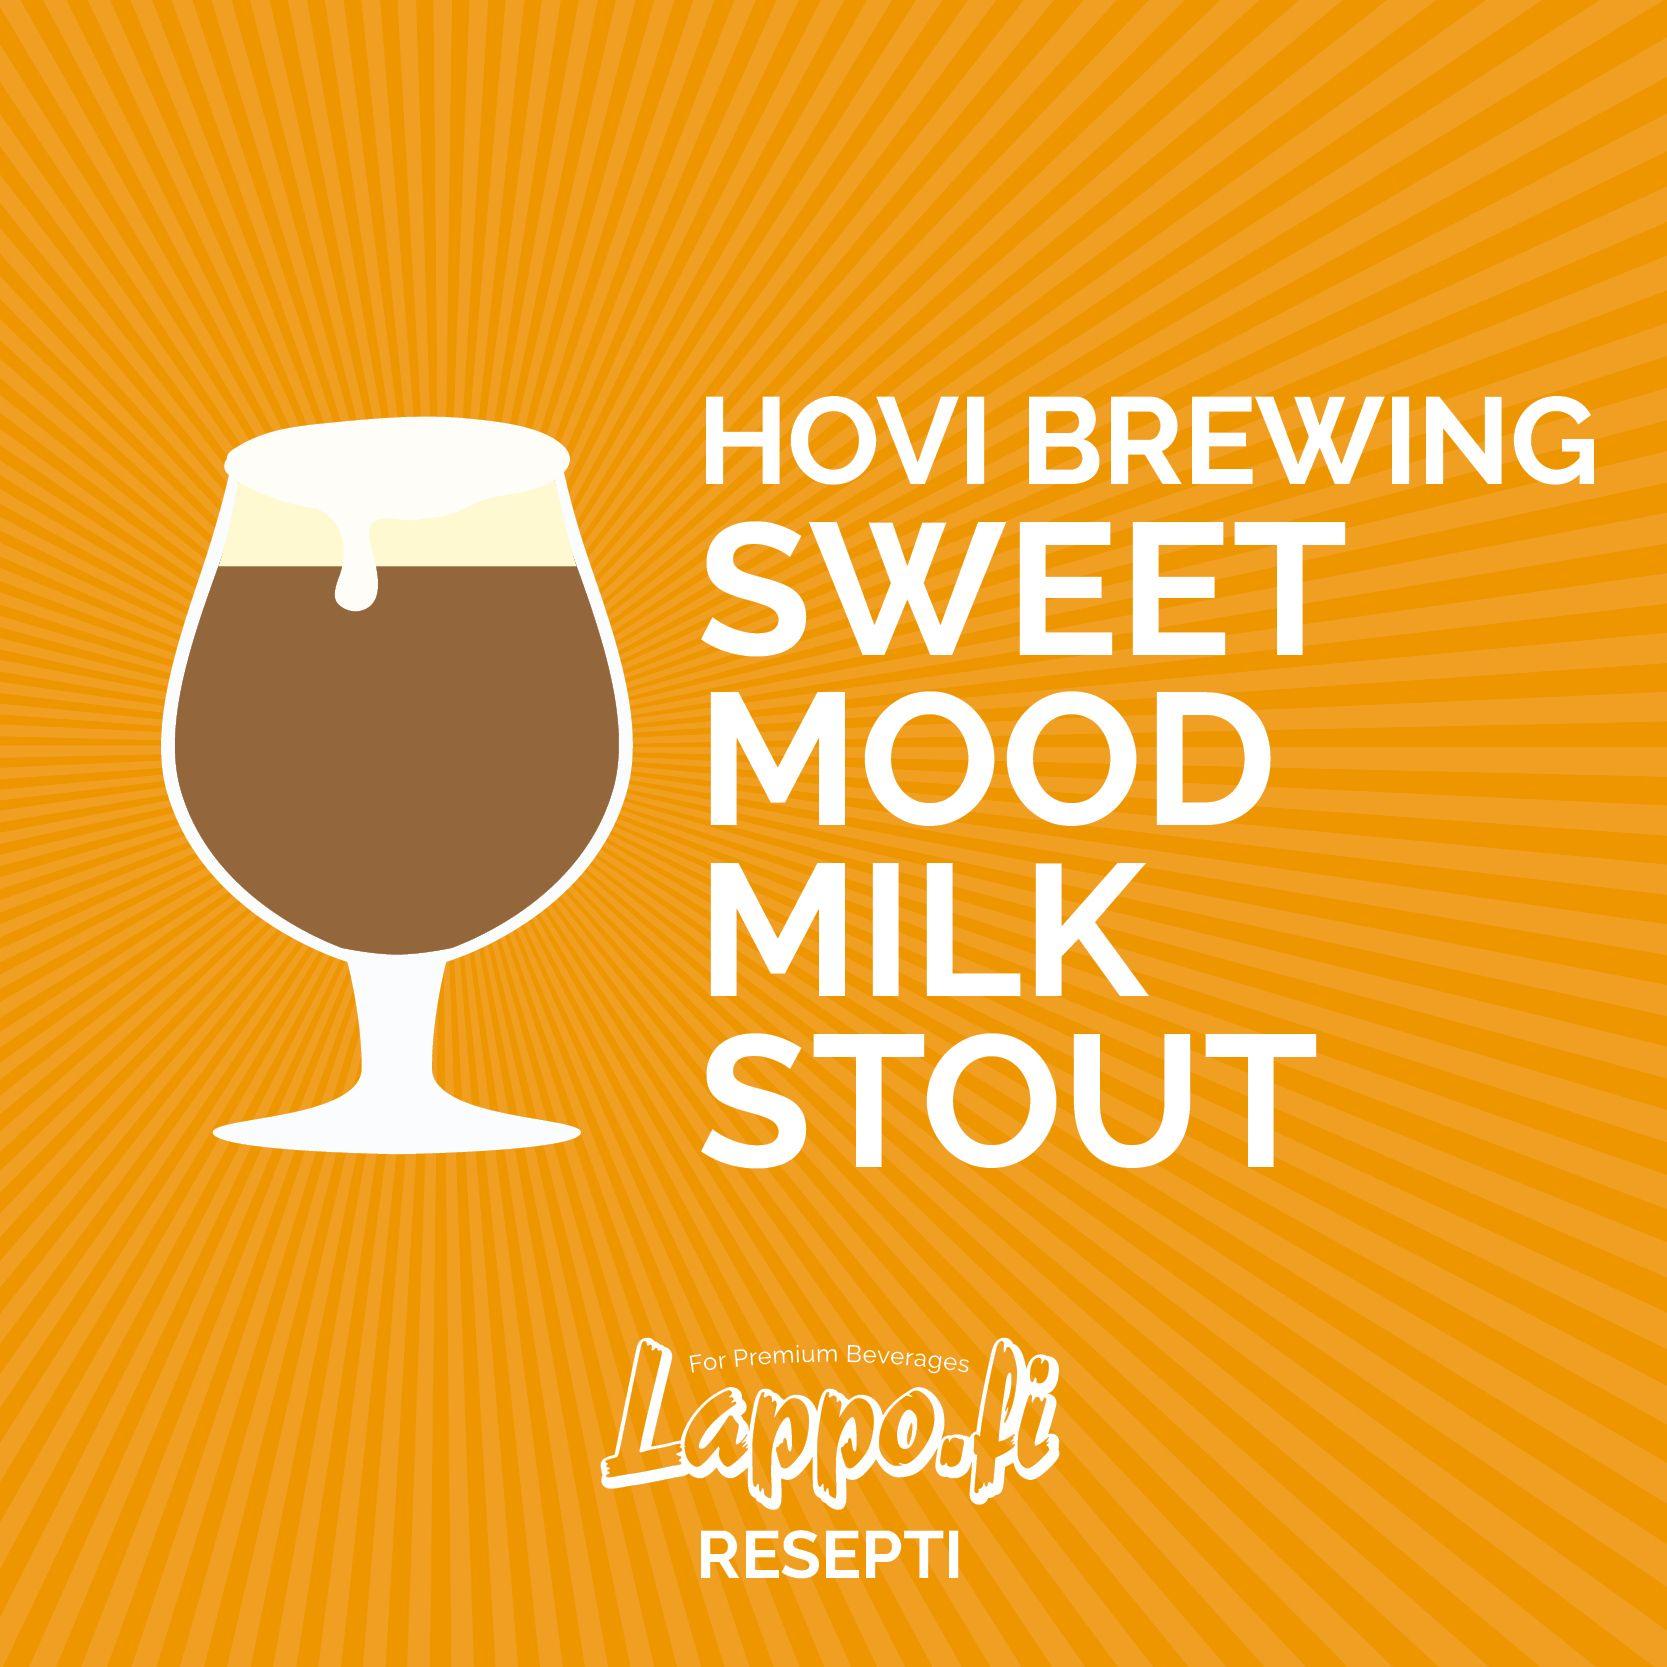 Hovi Brewing – Sweet Mood Milk Stout